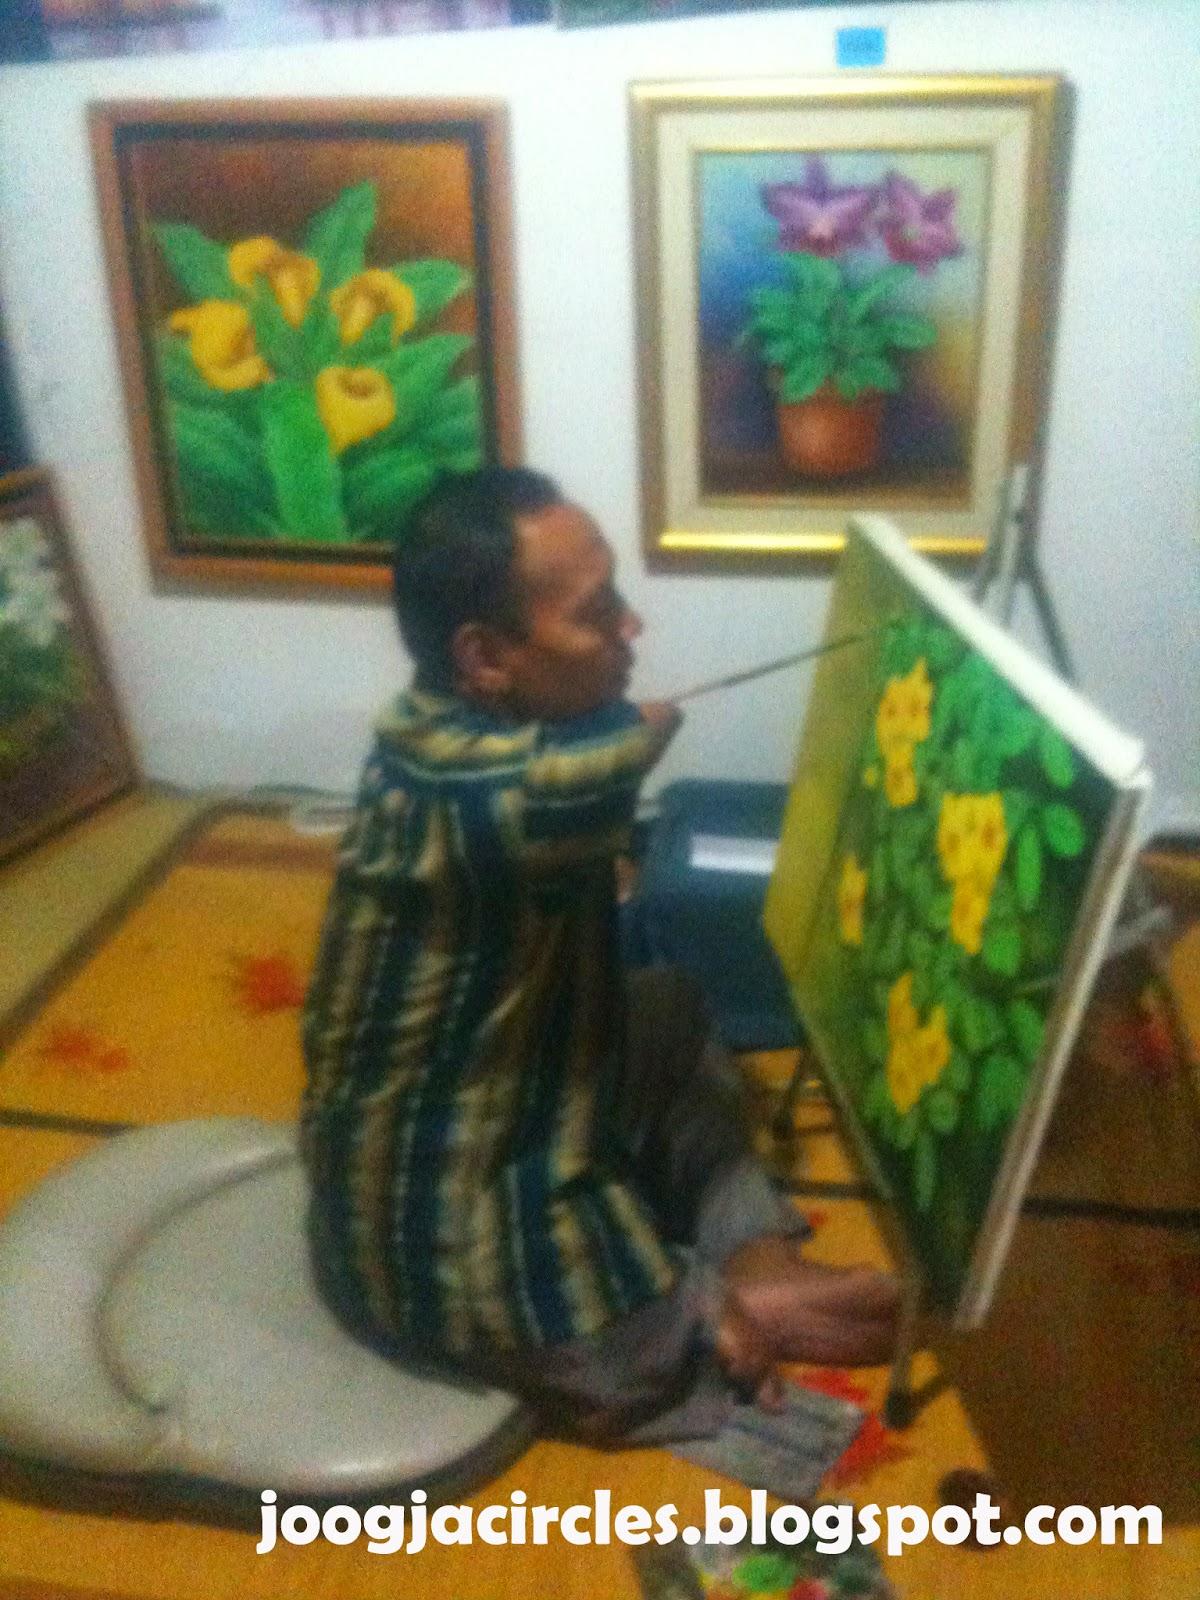 Mengagumi Karya Seniman AMFPA di FKY 2014 | Joogja Circles